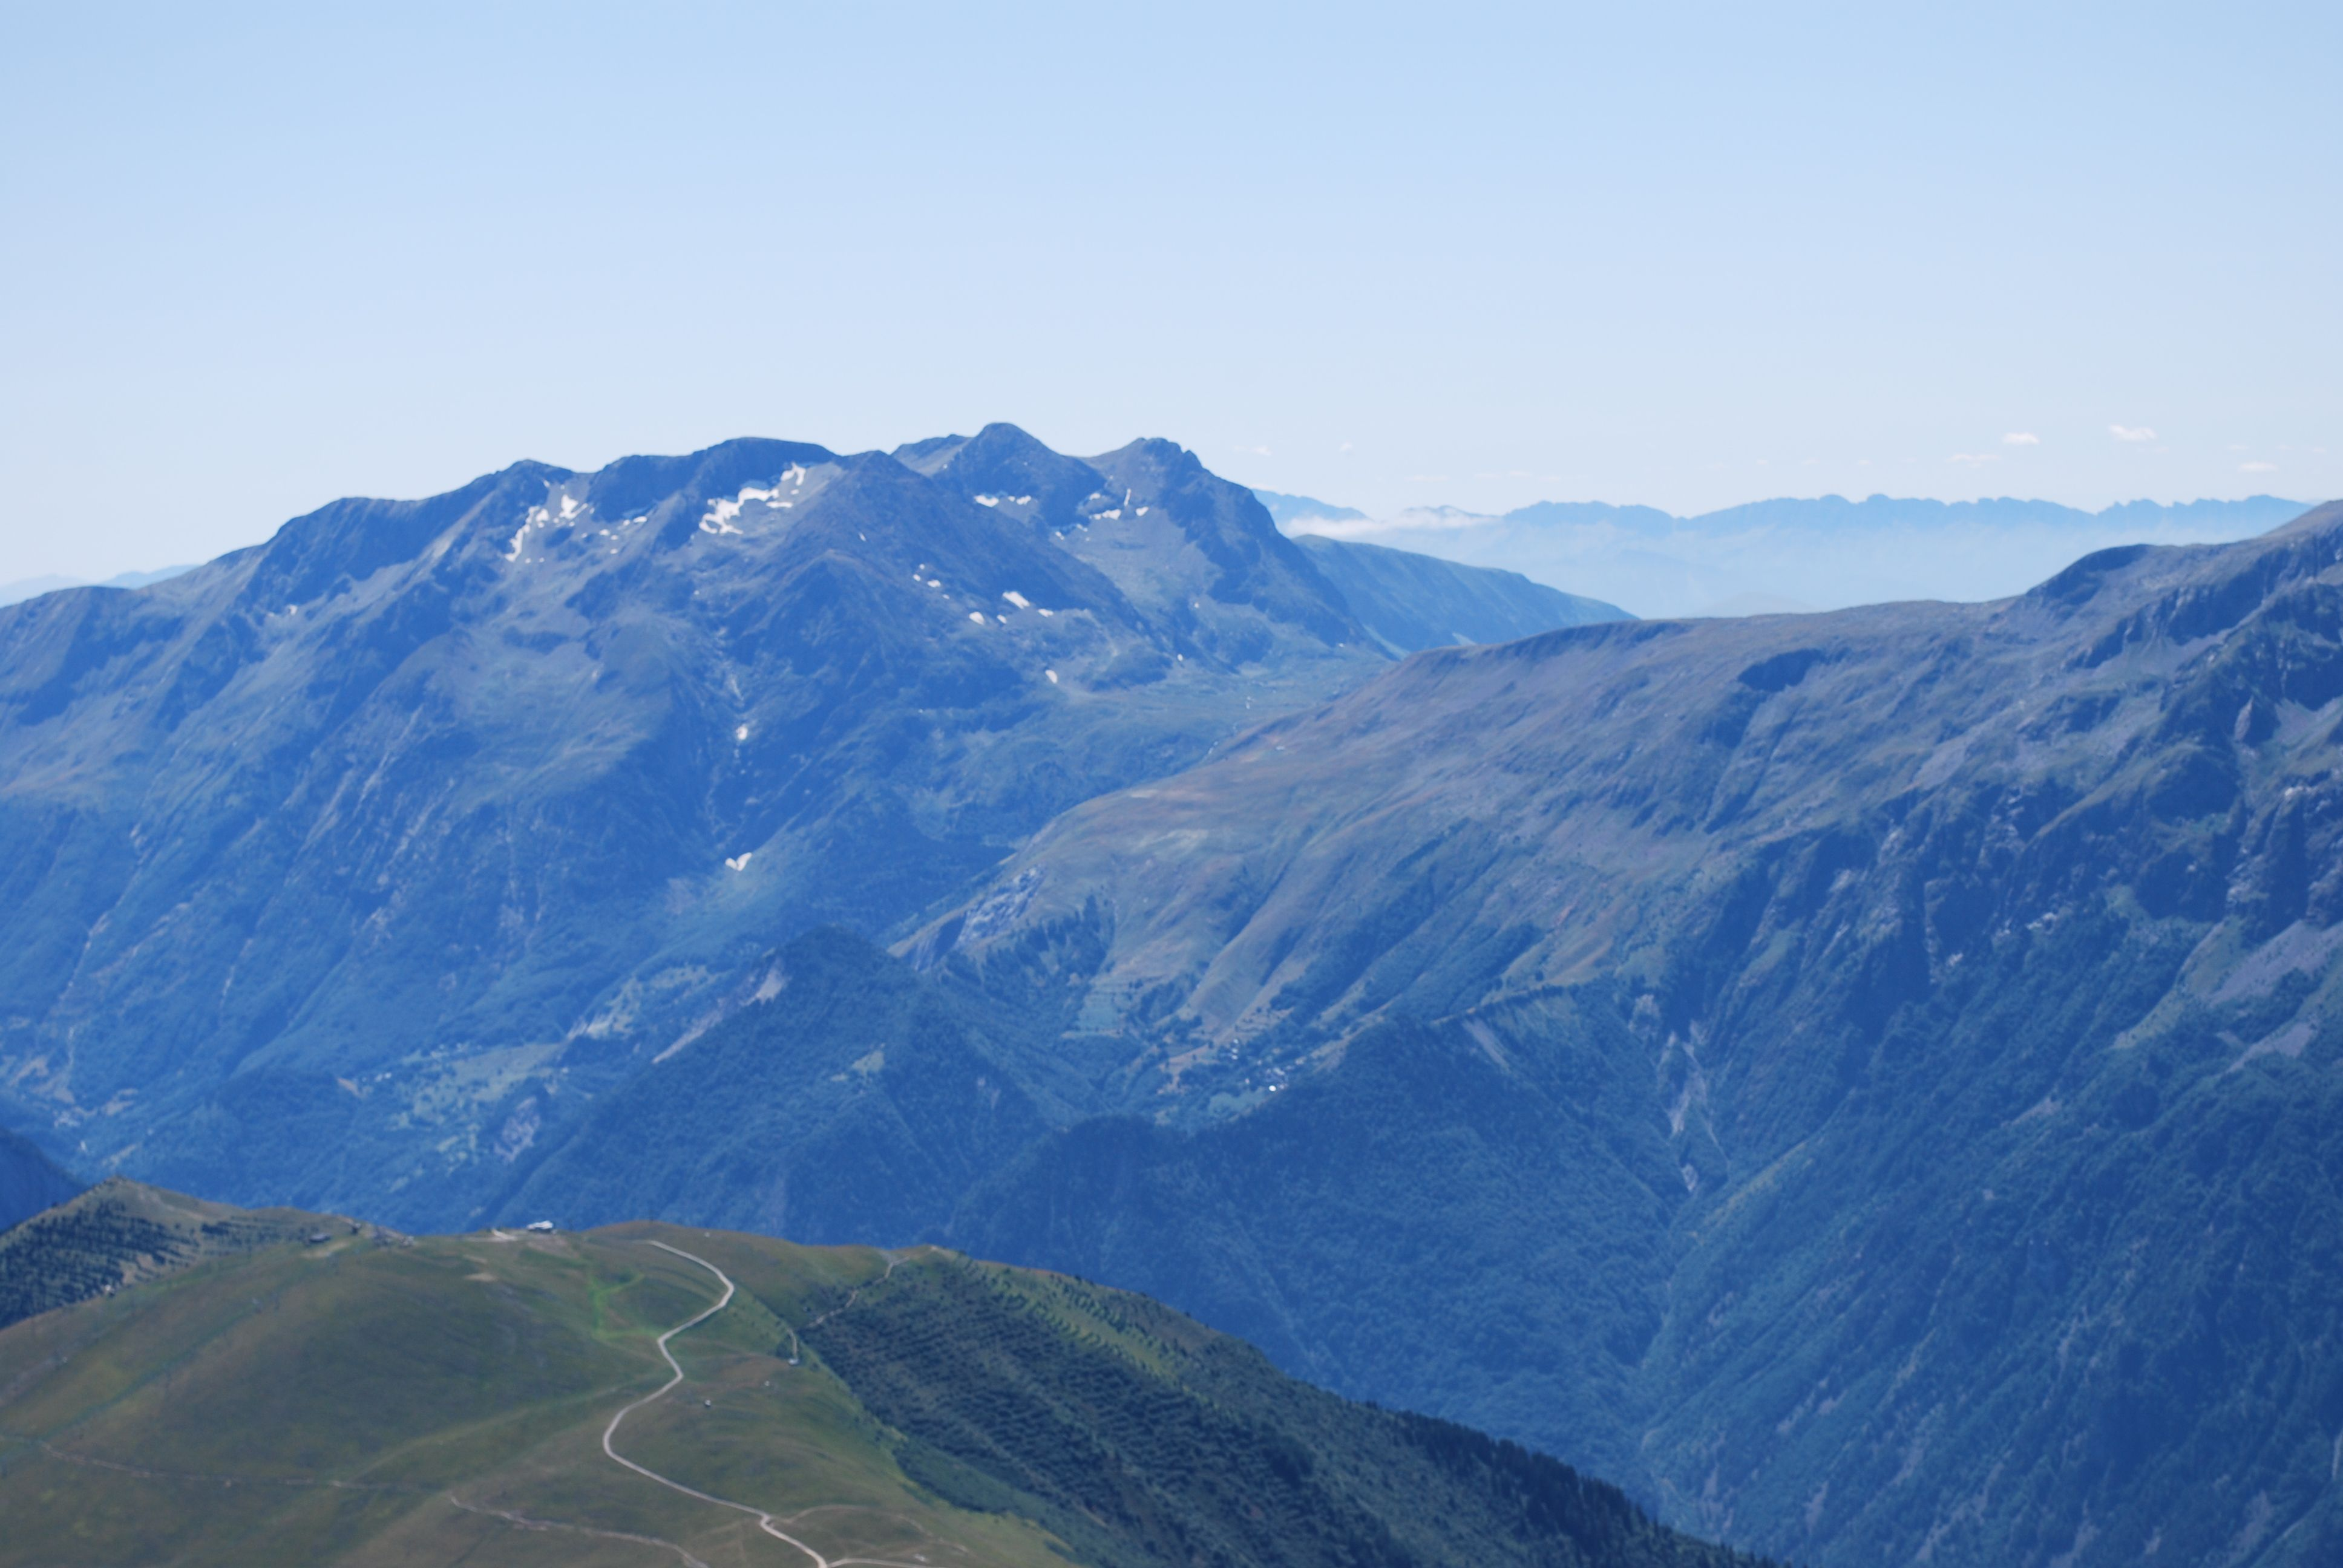 La montagne for Distri center la montagne